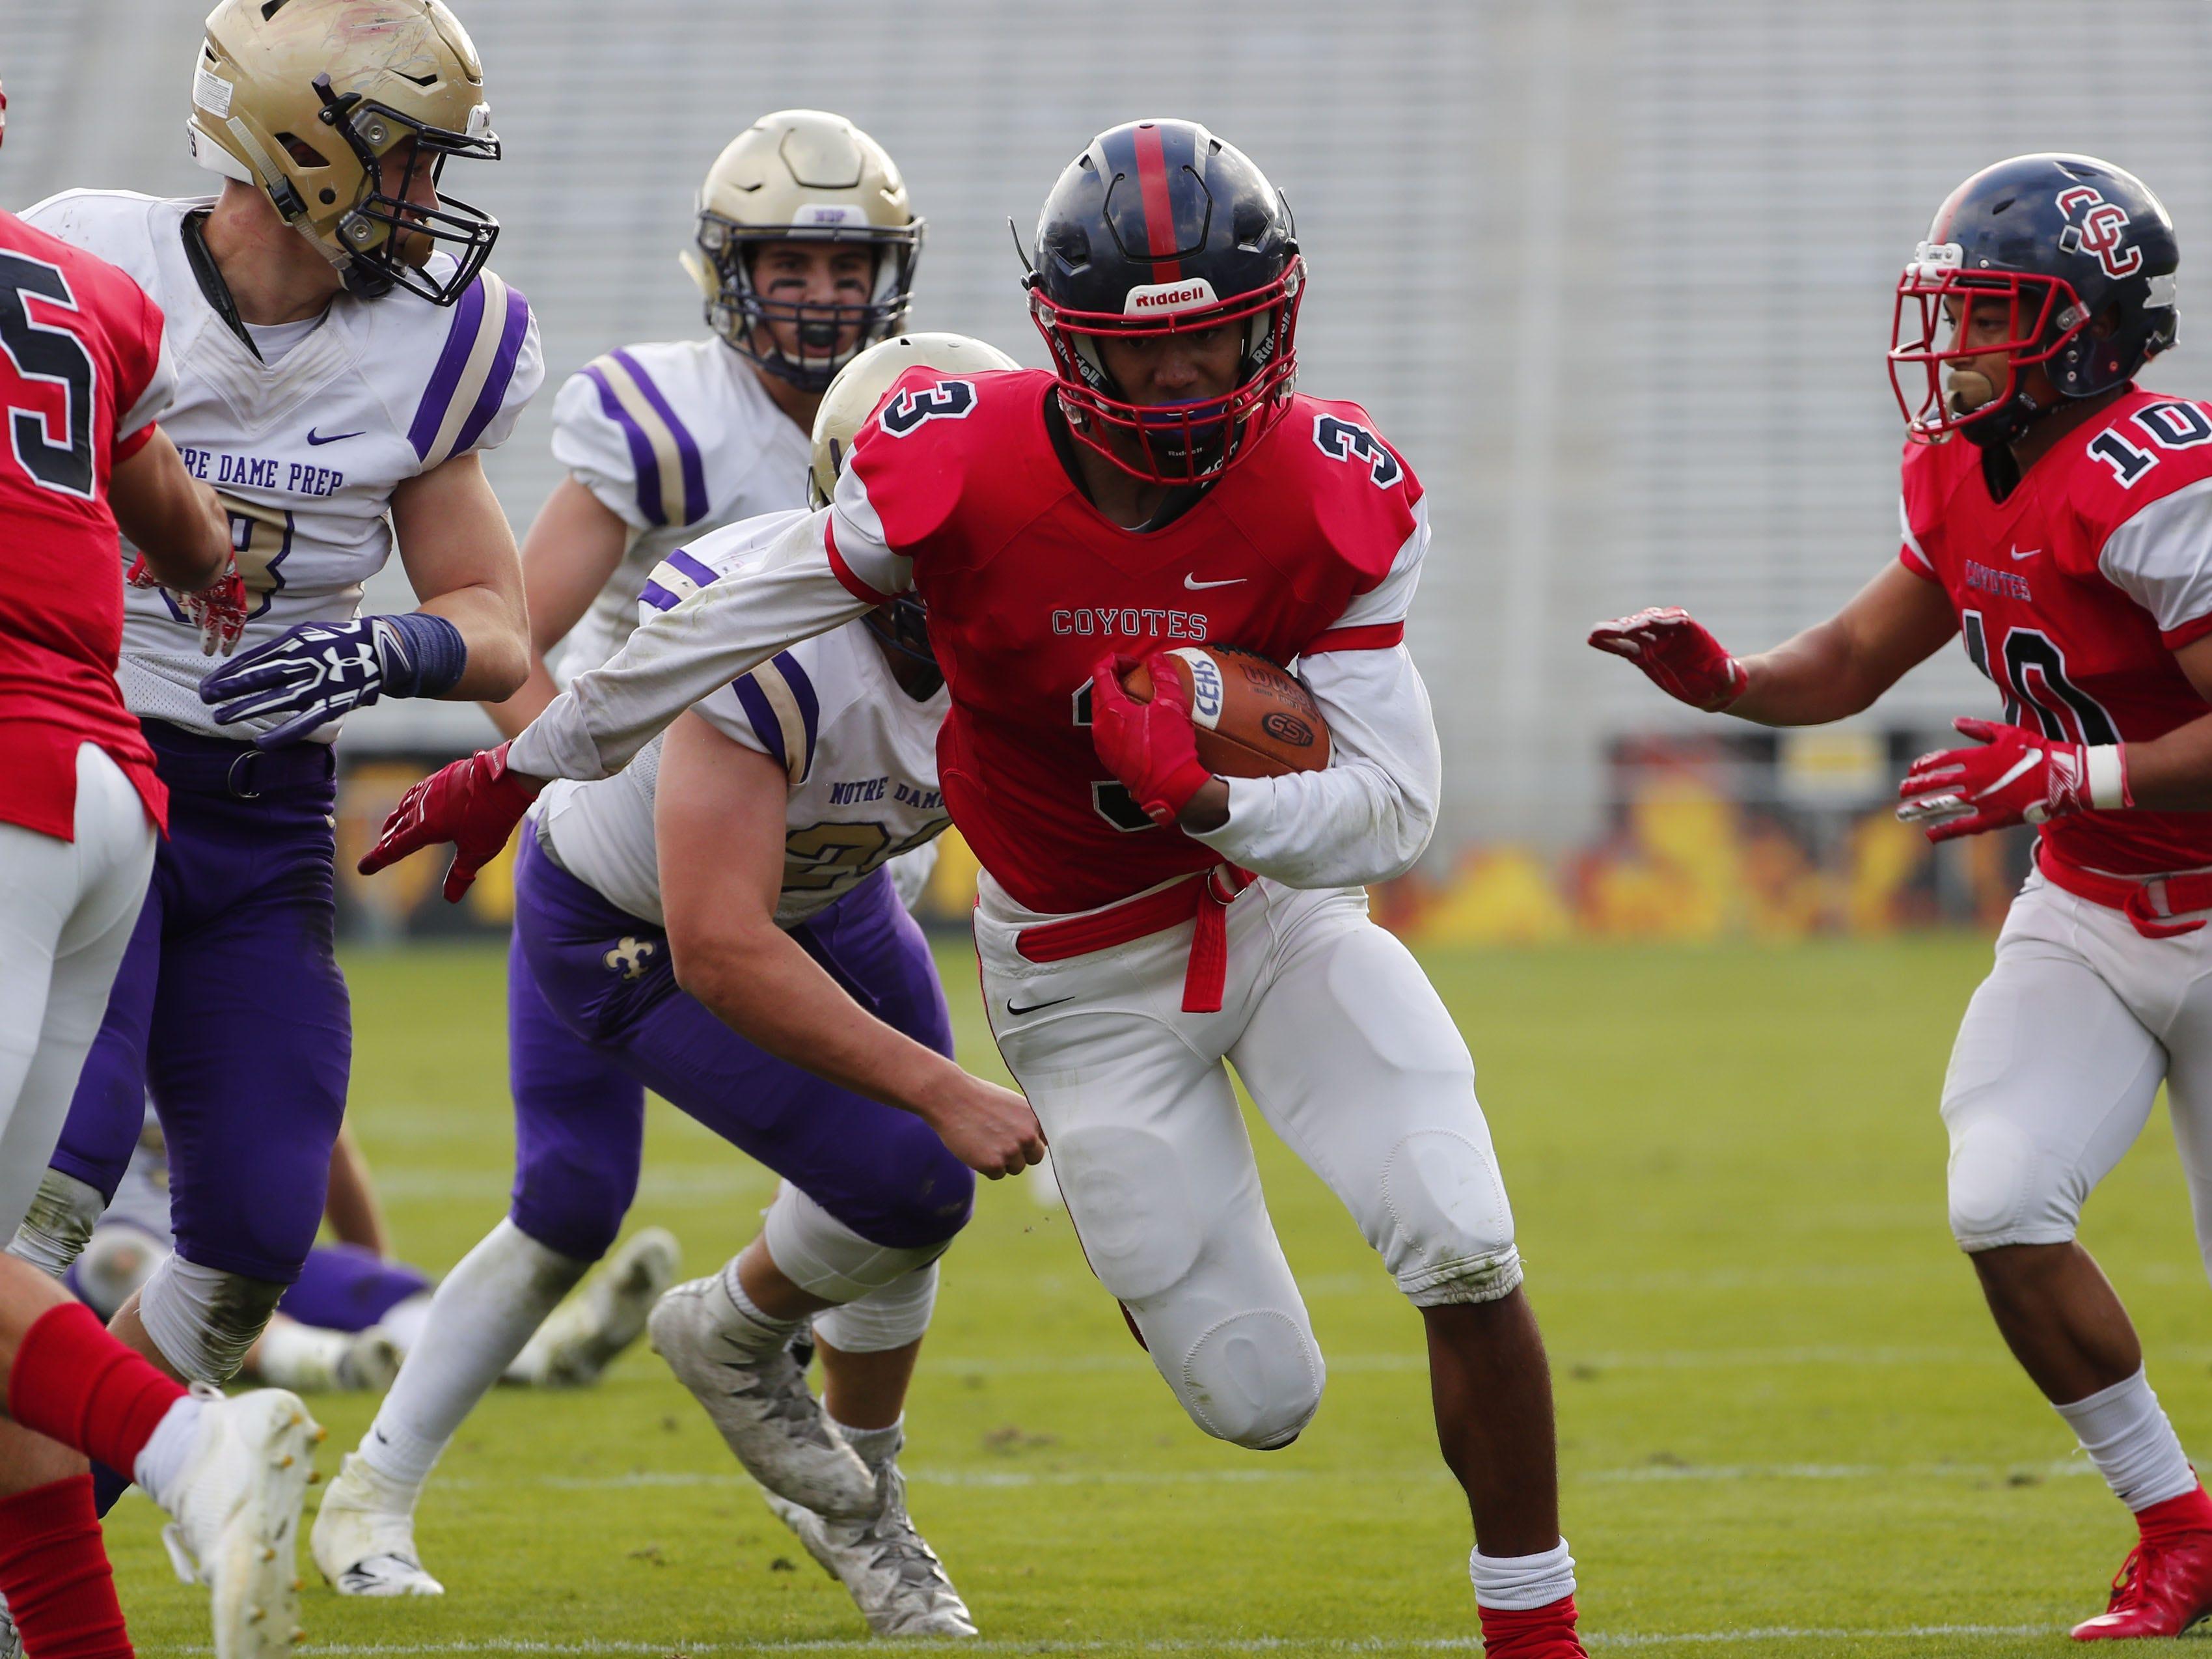 Centennial's Jaydin Young (3) runs for a touchdown against Notre Dame Prep during the 5A state football championship at Sun Devil Stadium December 1, 2018. Centennial won 60-7. #azhsfb